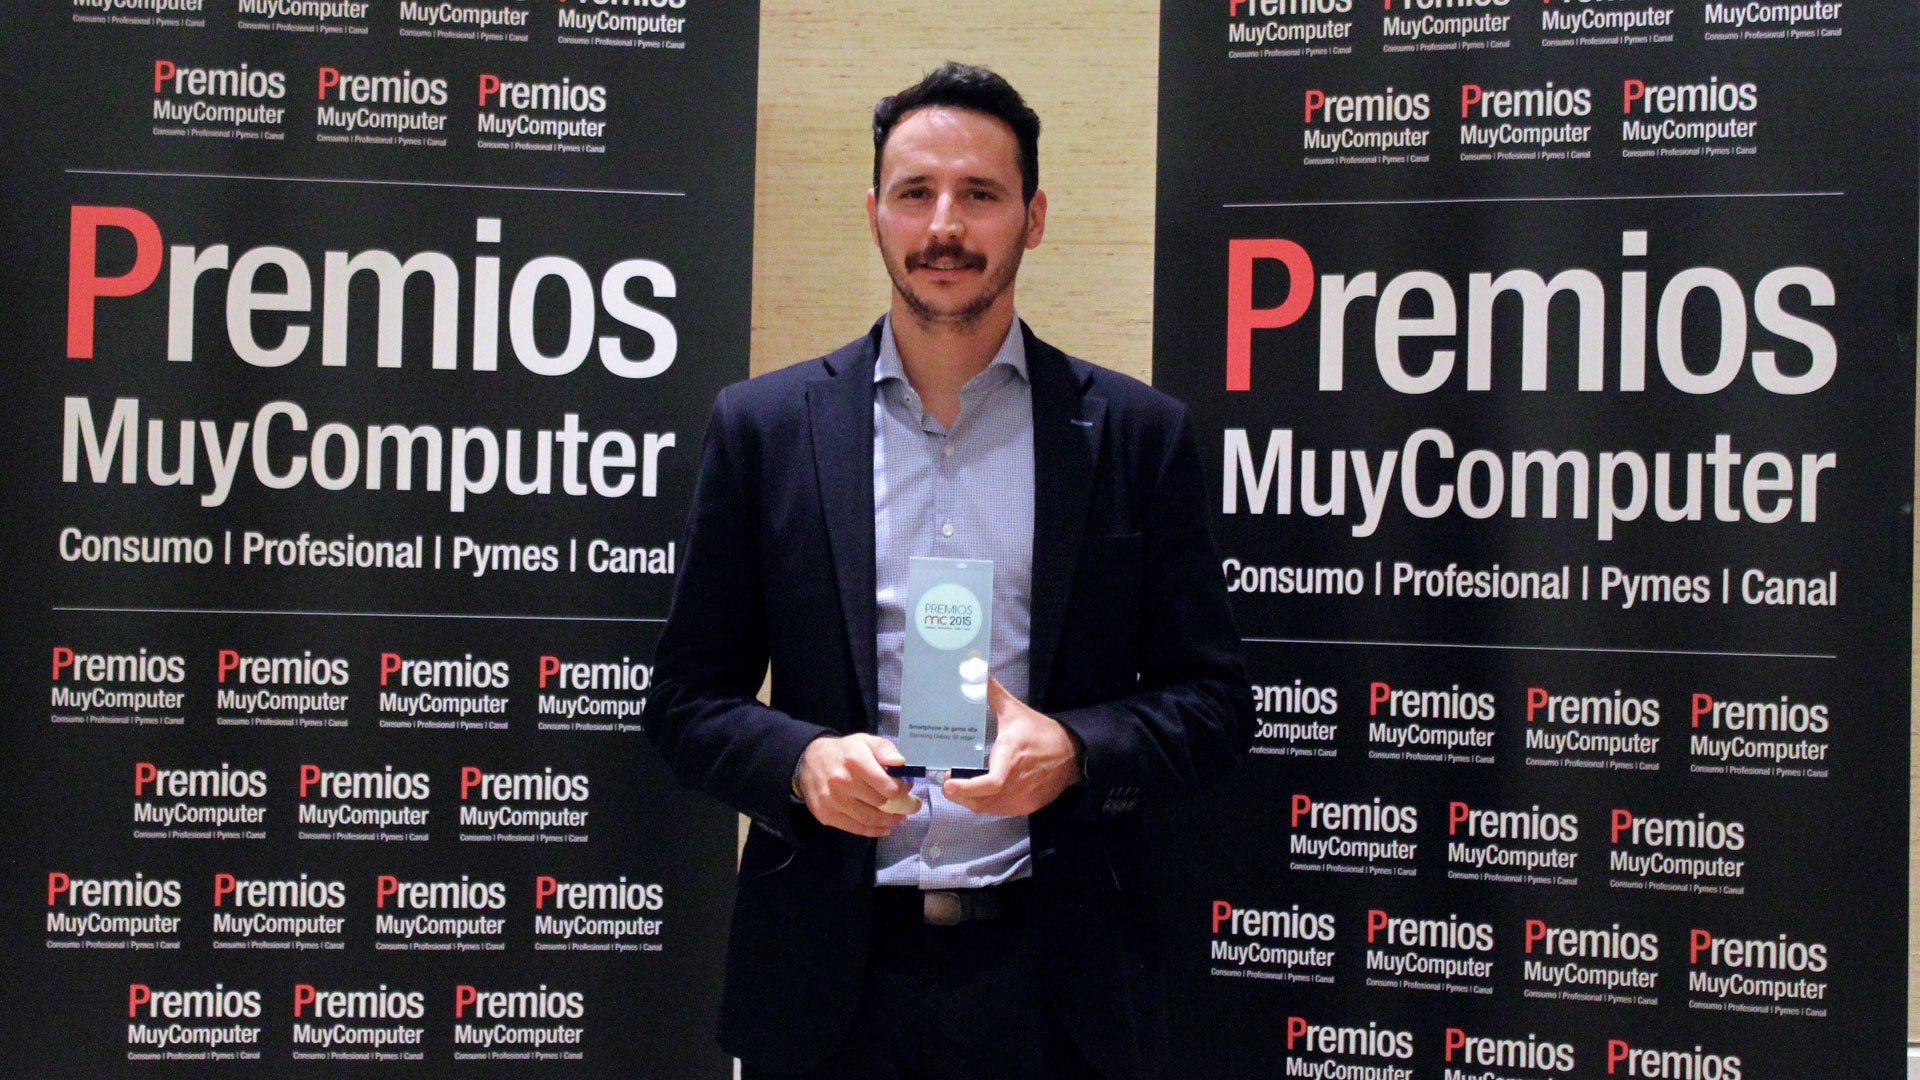 premios-mc2015-samsung-galaxy-s6-edge-smartphone-gama-alta